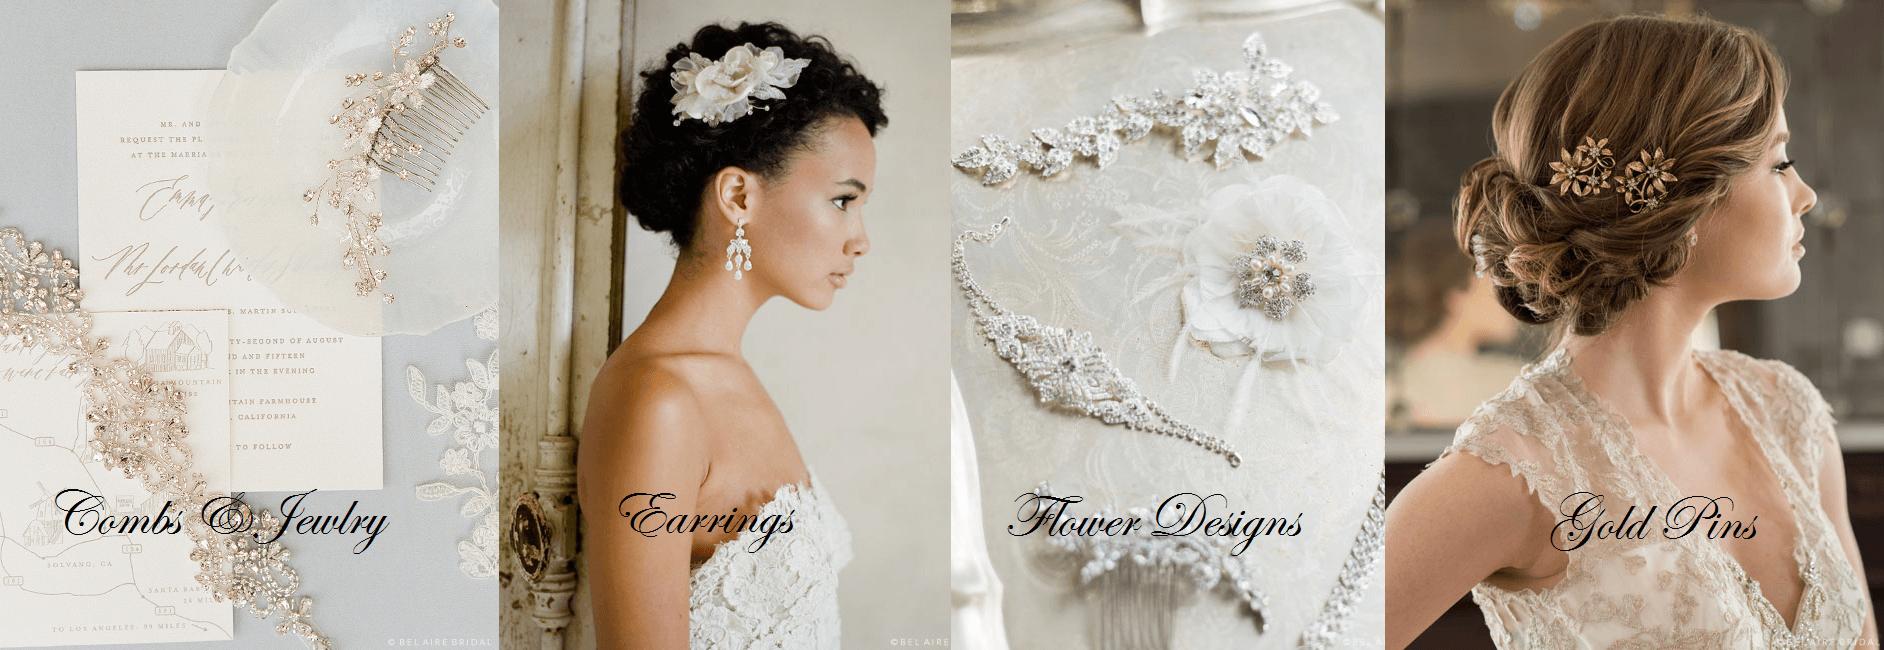 Wedding Hair Accessories, Bel Aire Halos, Bel Aiire combs